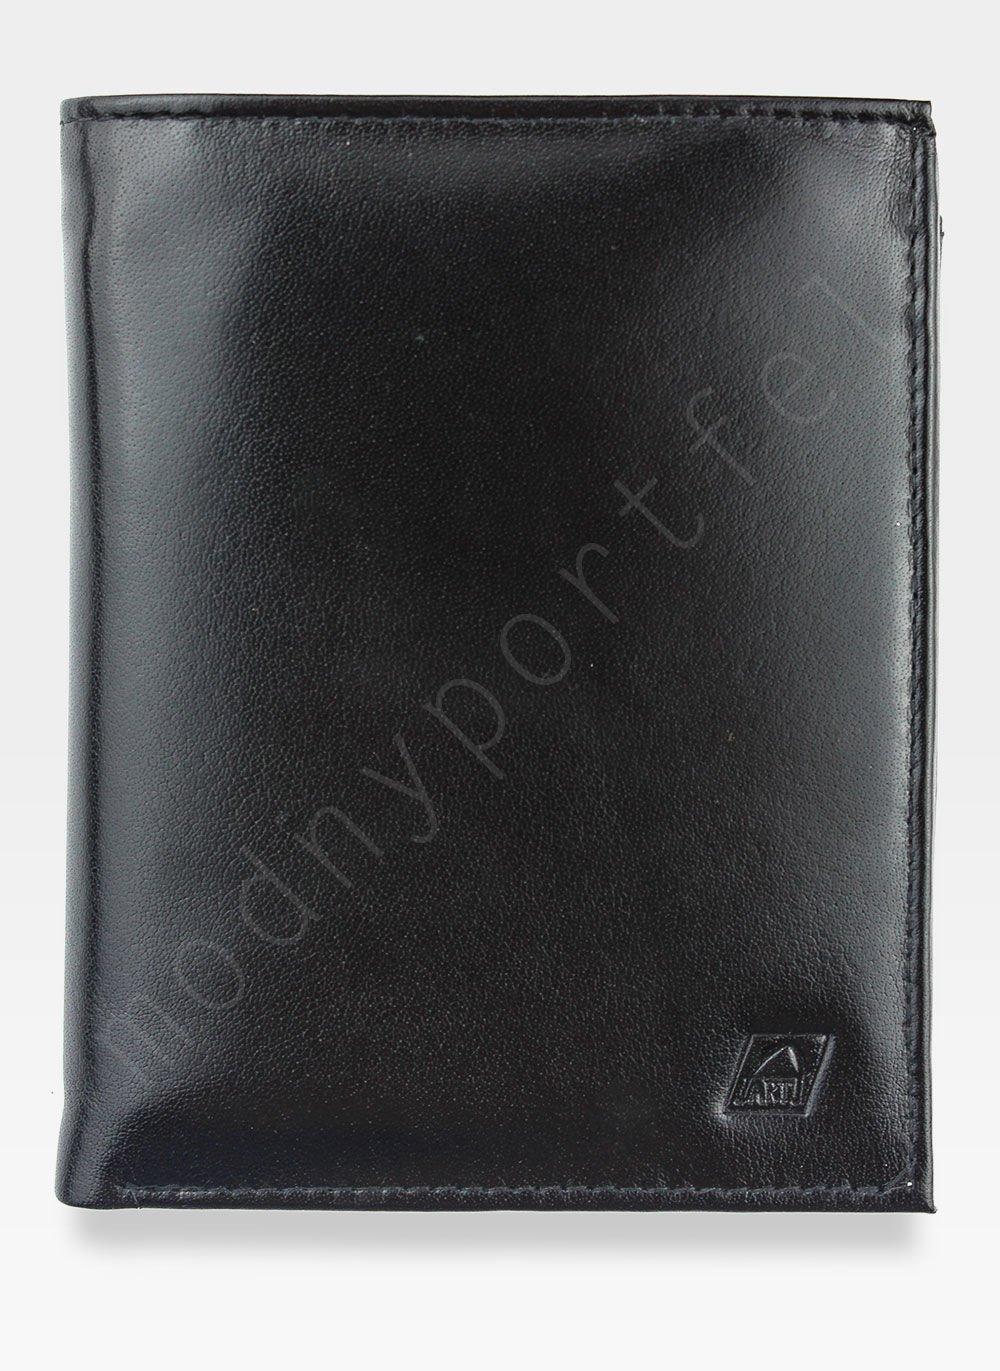 3fdb27edb0f98 Portfel Męski Skórzany A-Art Elegancki DUŻY 3496 n51 Czarny RFID Kliknij